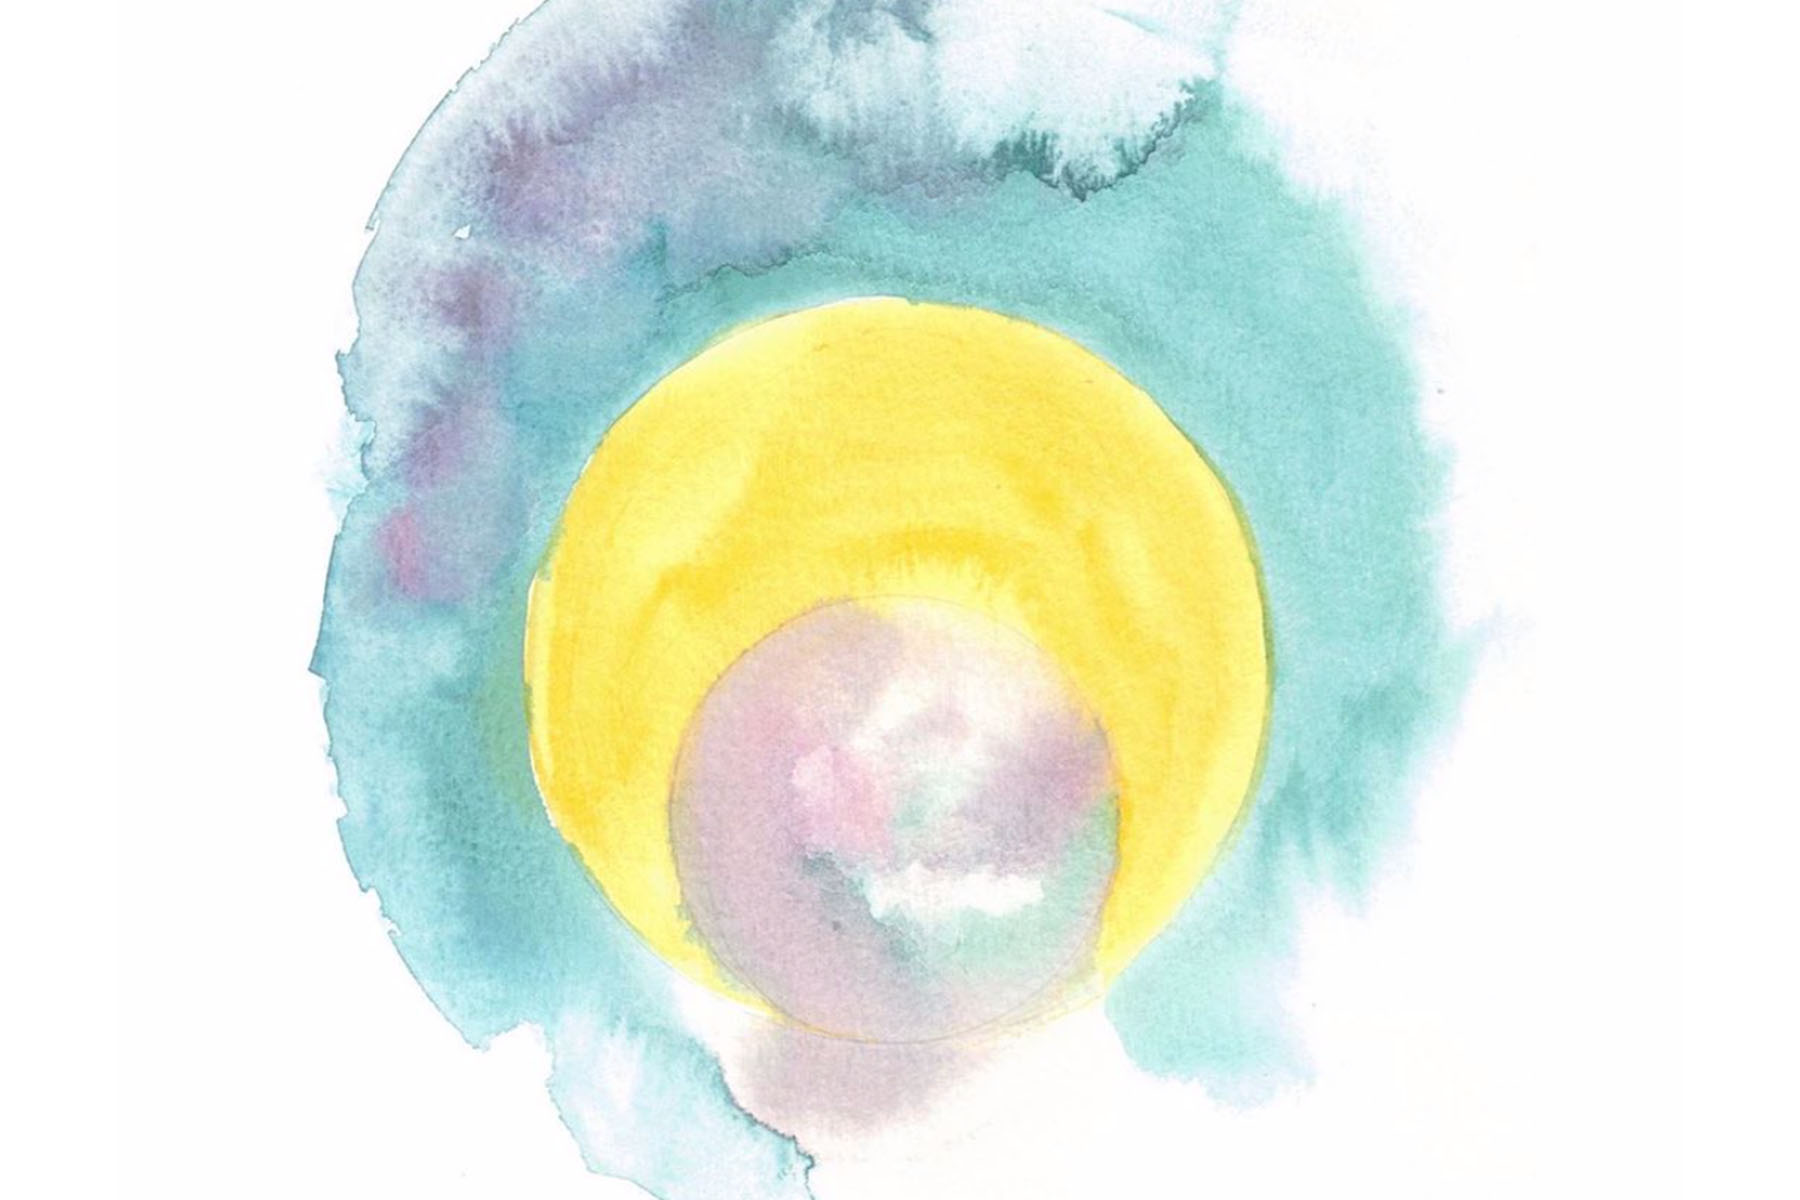 march 2 horoscope